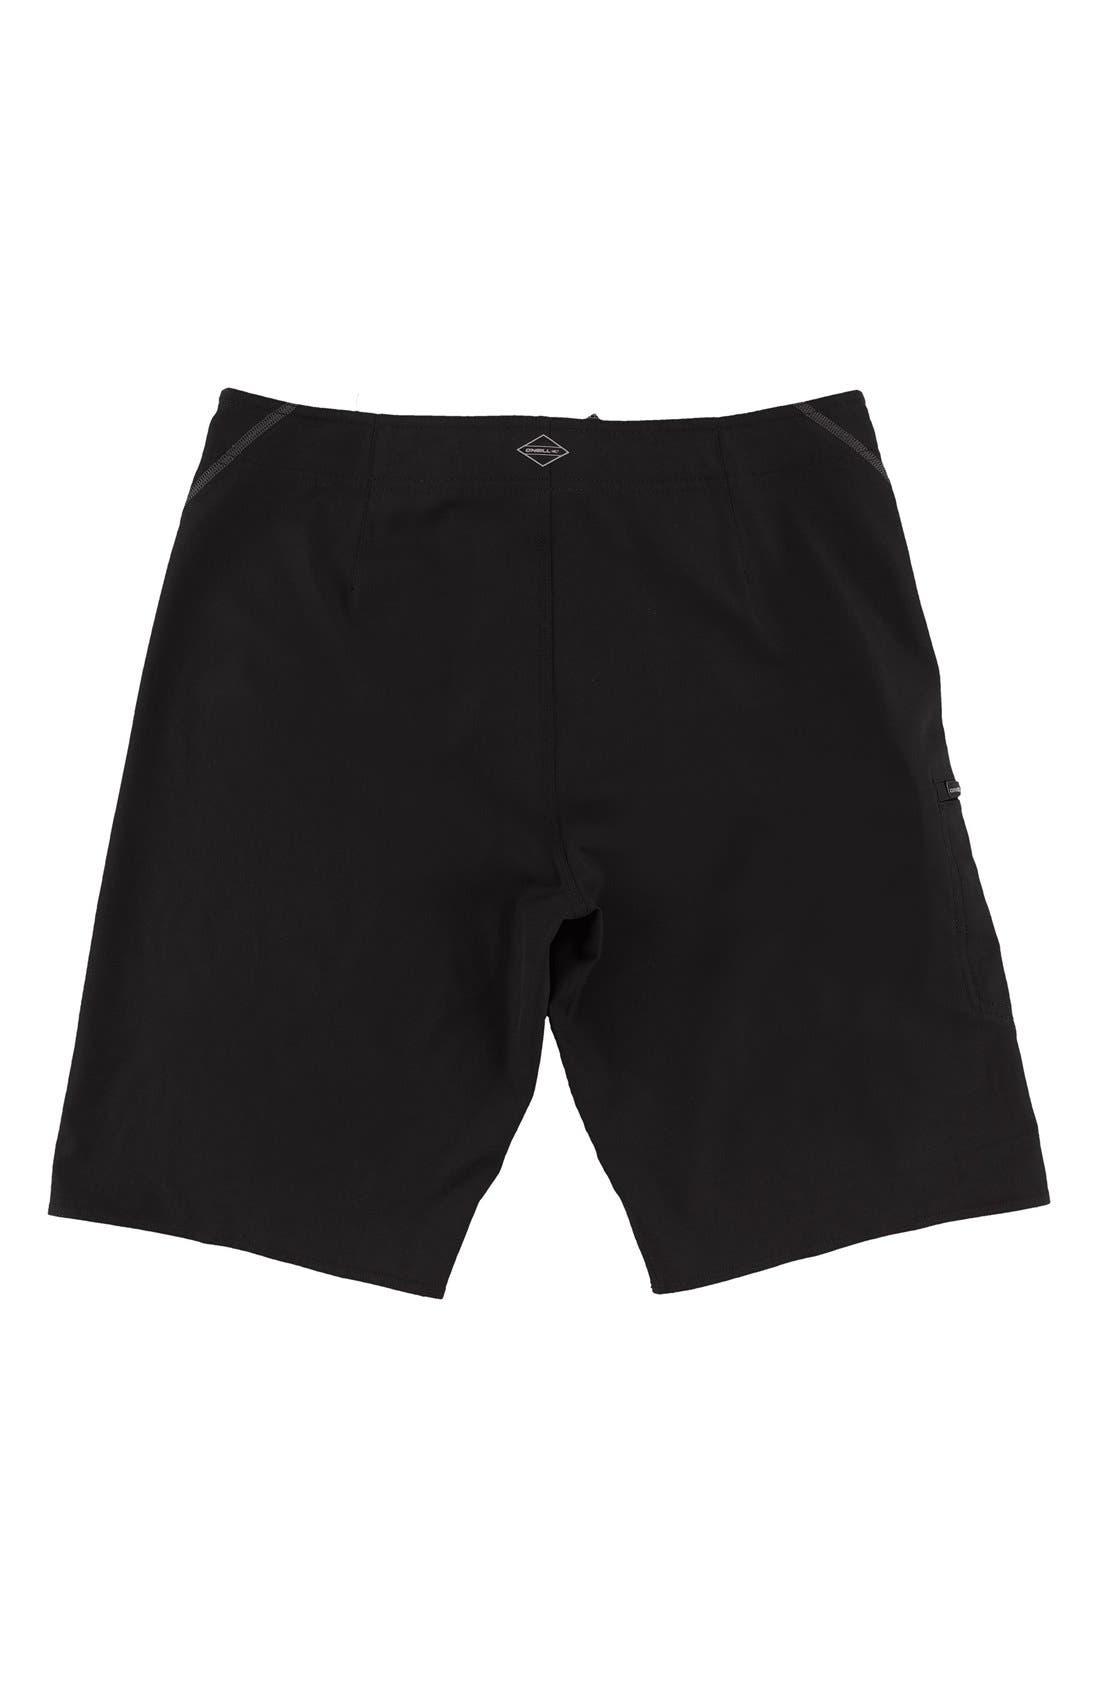 Hyperfreak S-Seam Stretch Board Shorts,                             Alternate thumbnail 2, color,                             001